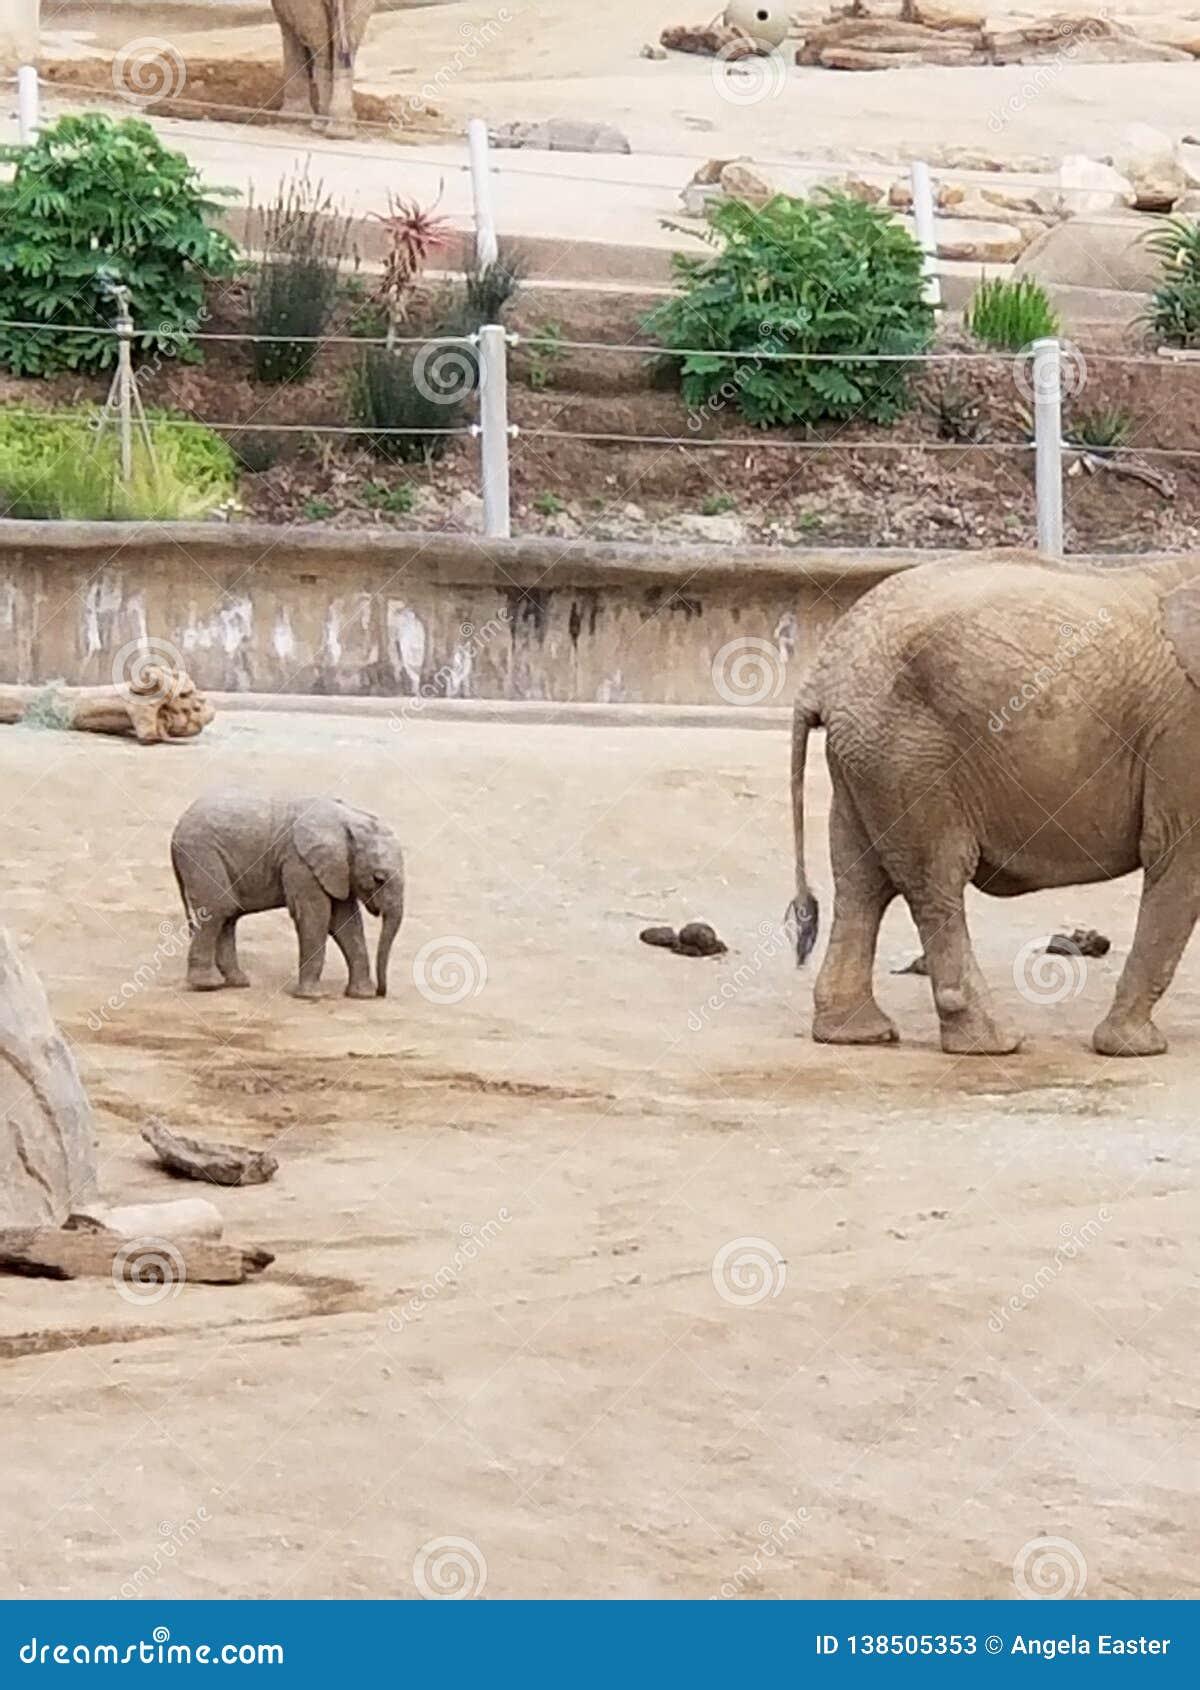 Мама Слон с младенцем